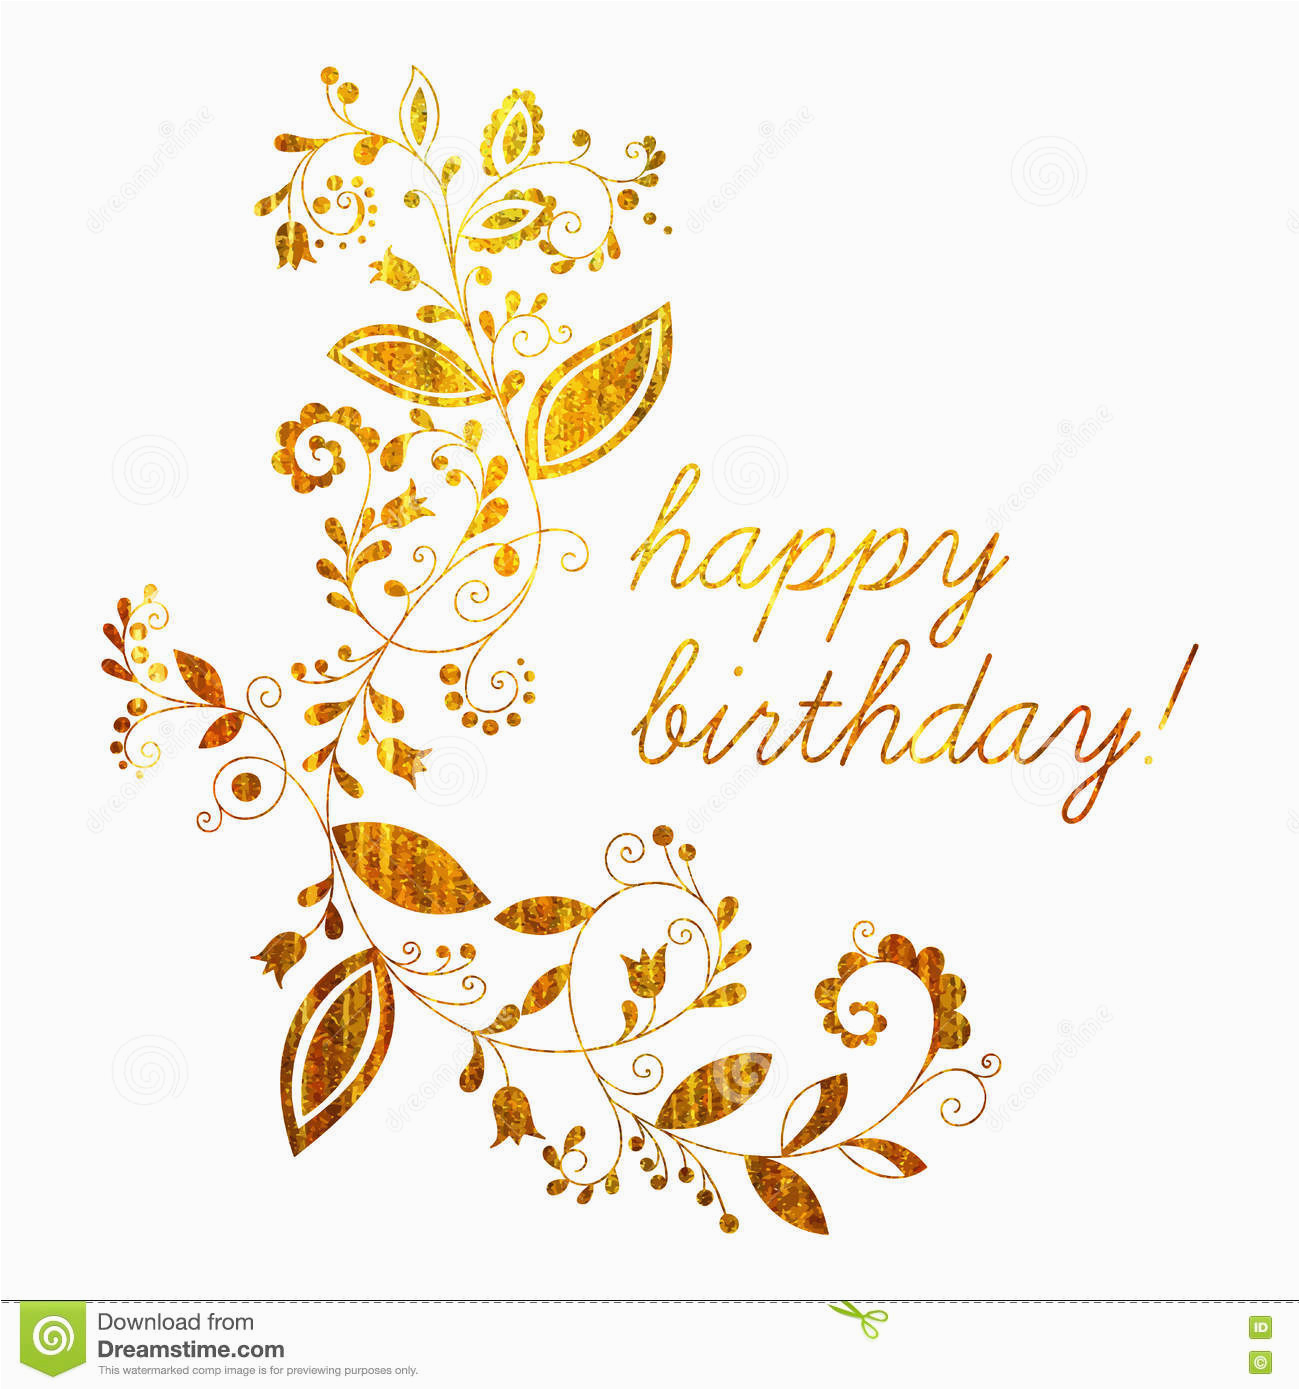 stock illustration gold greeting happy birthday card floral element doodle style white background hand drawn flourish border frame image75219224